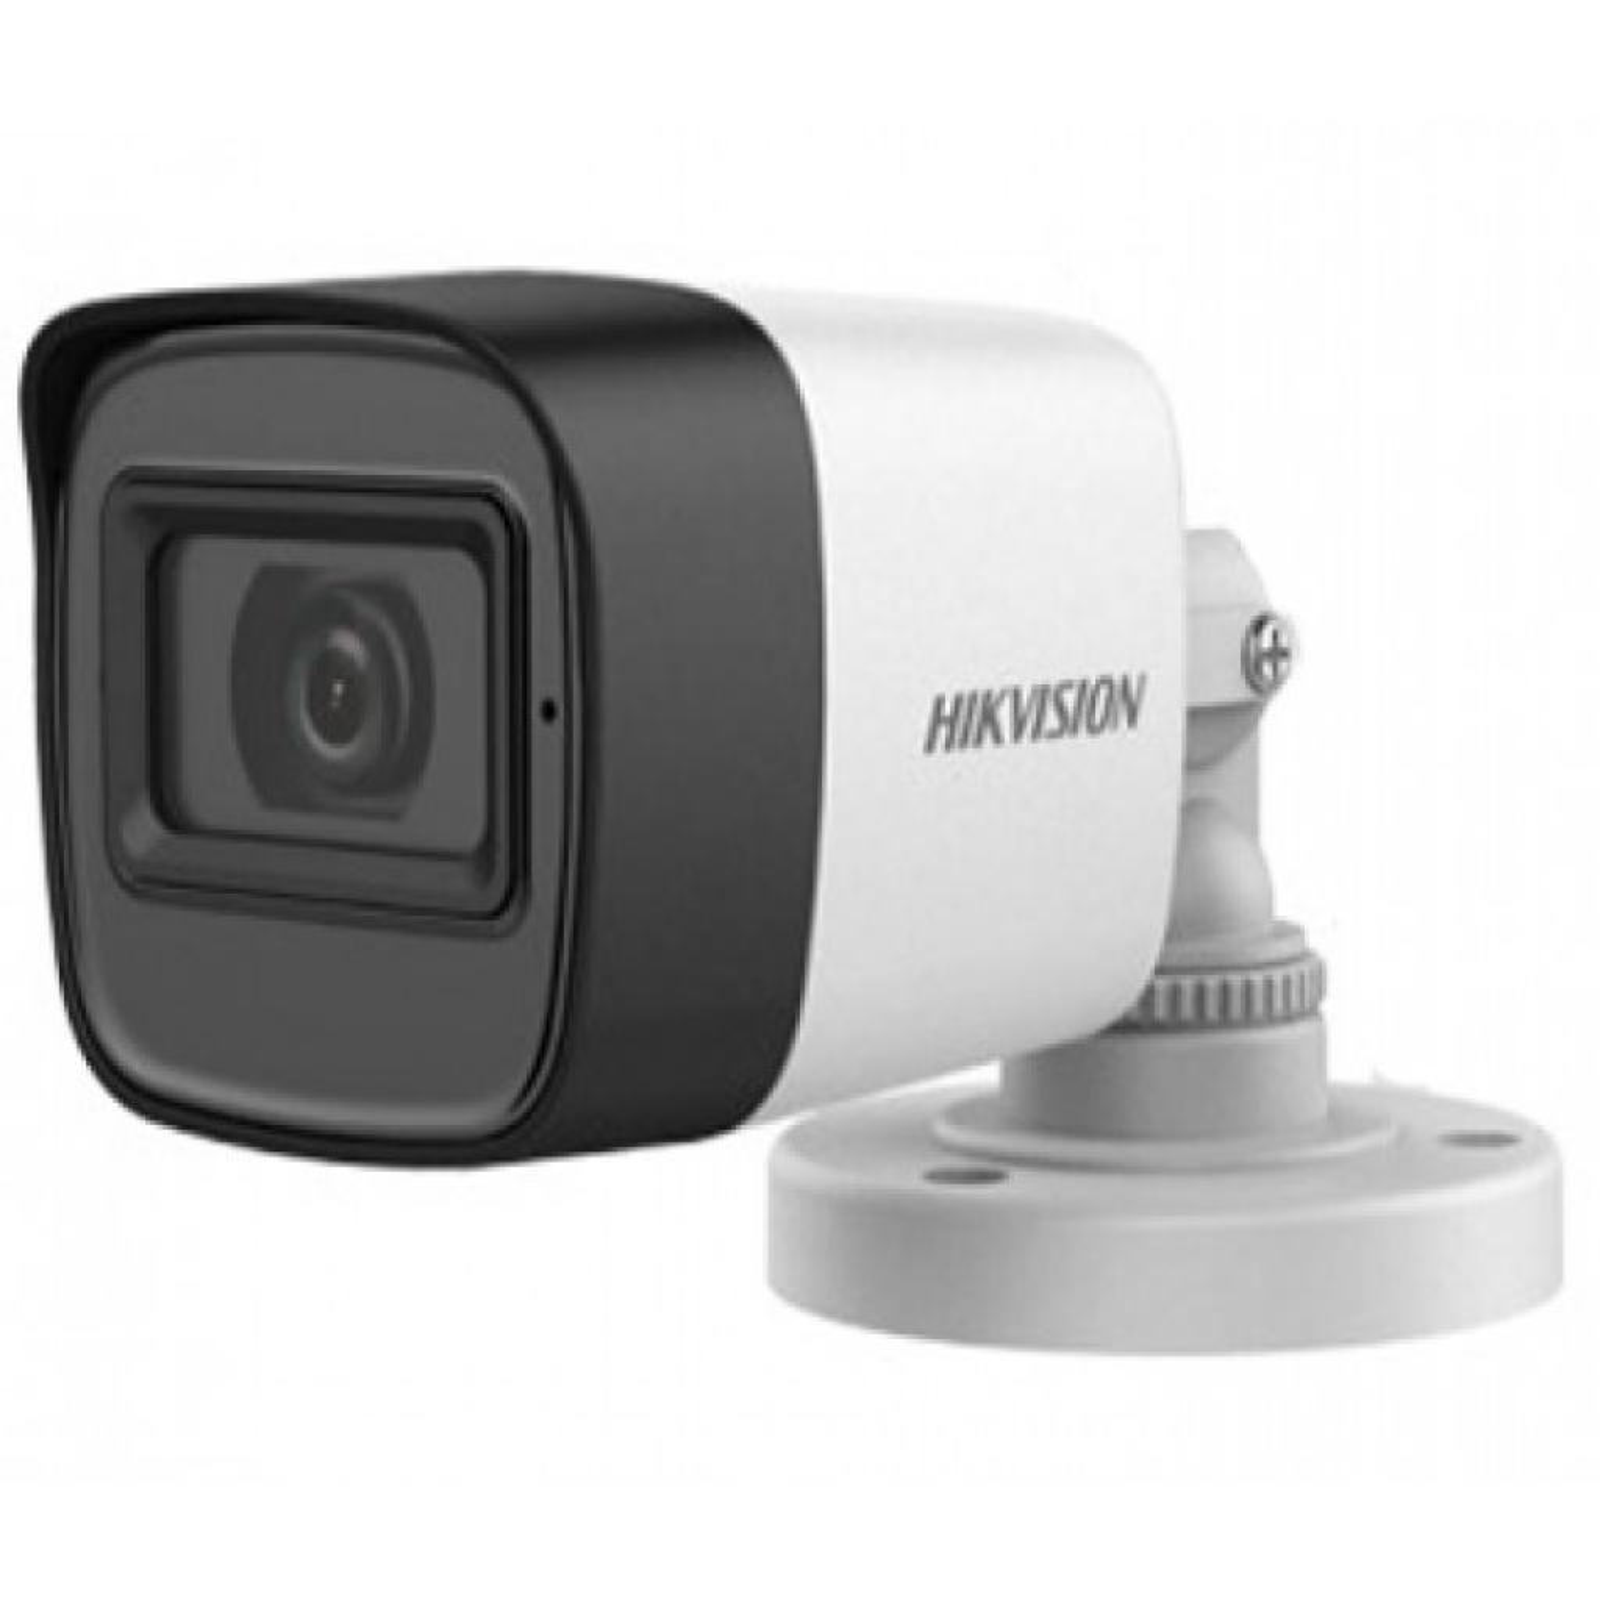 Камера видеонаблюдения Hikvision DS-2CE16D0T-ITFS (2.8)